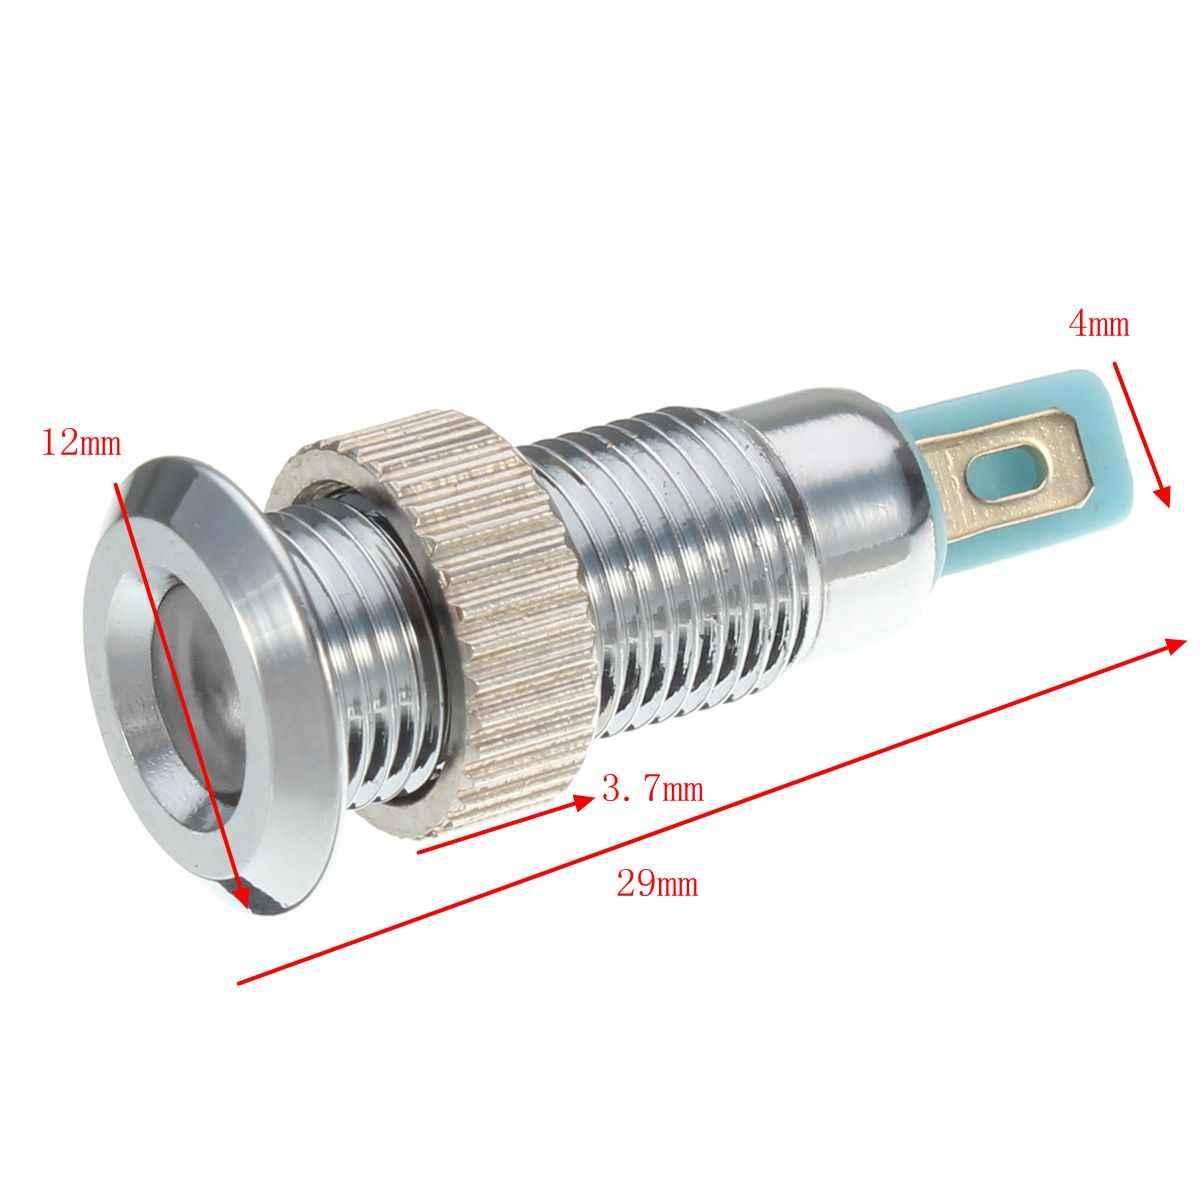 Universal 6 V 8 Mm Logam LED Dash Panel Peringatan Lampu Indikator untuk Mobil Truk